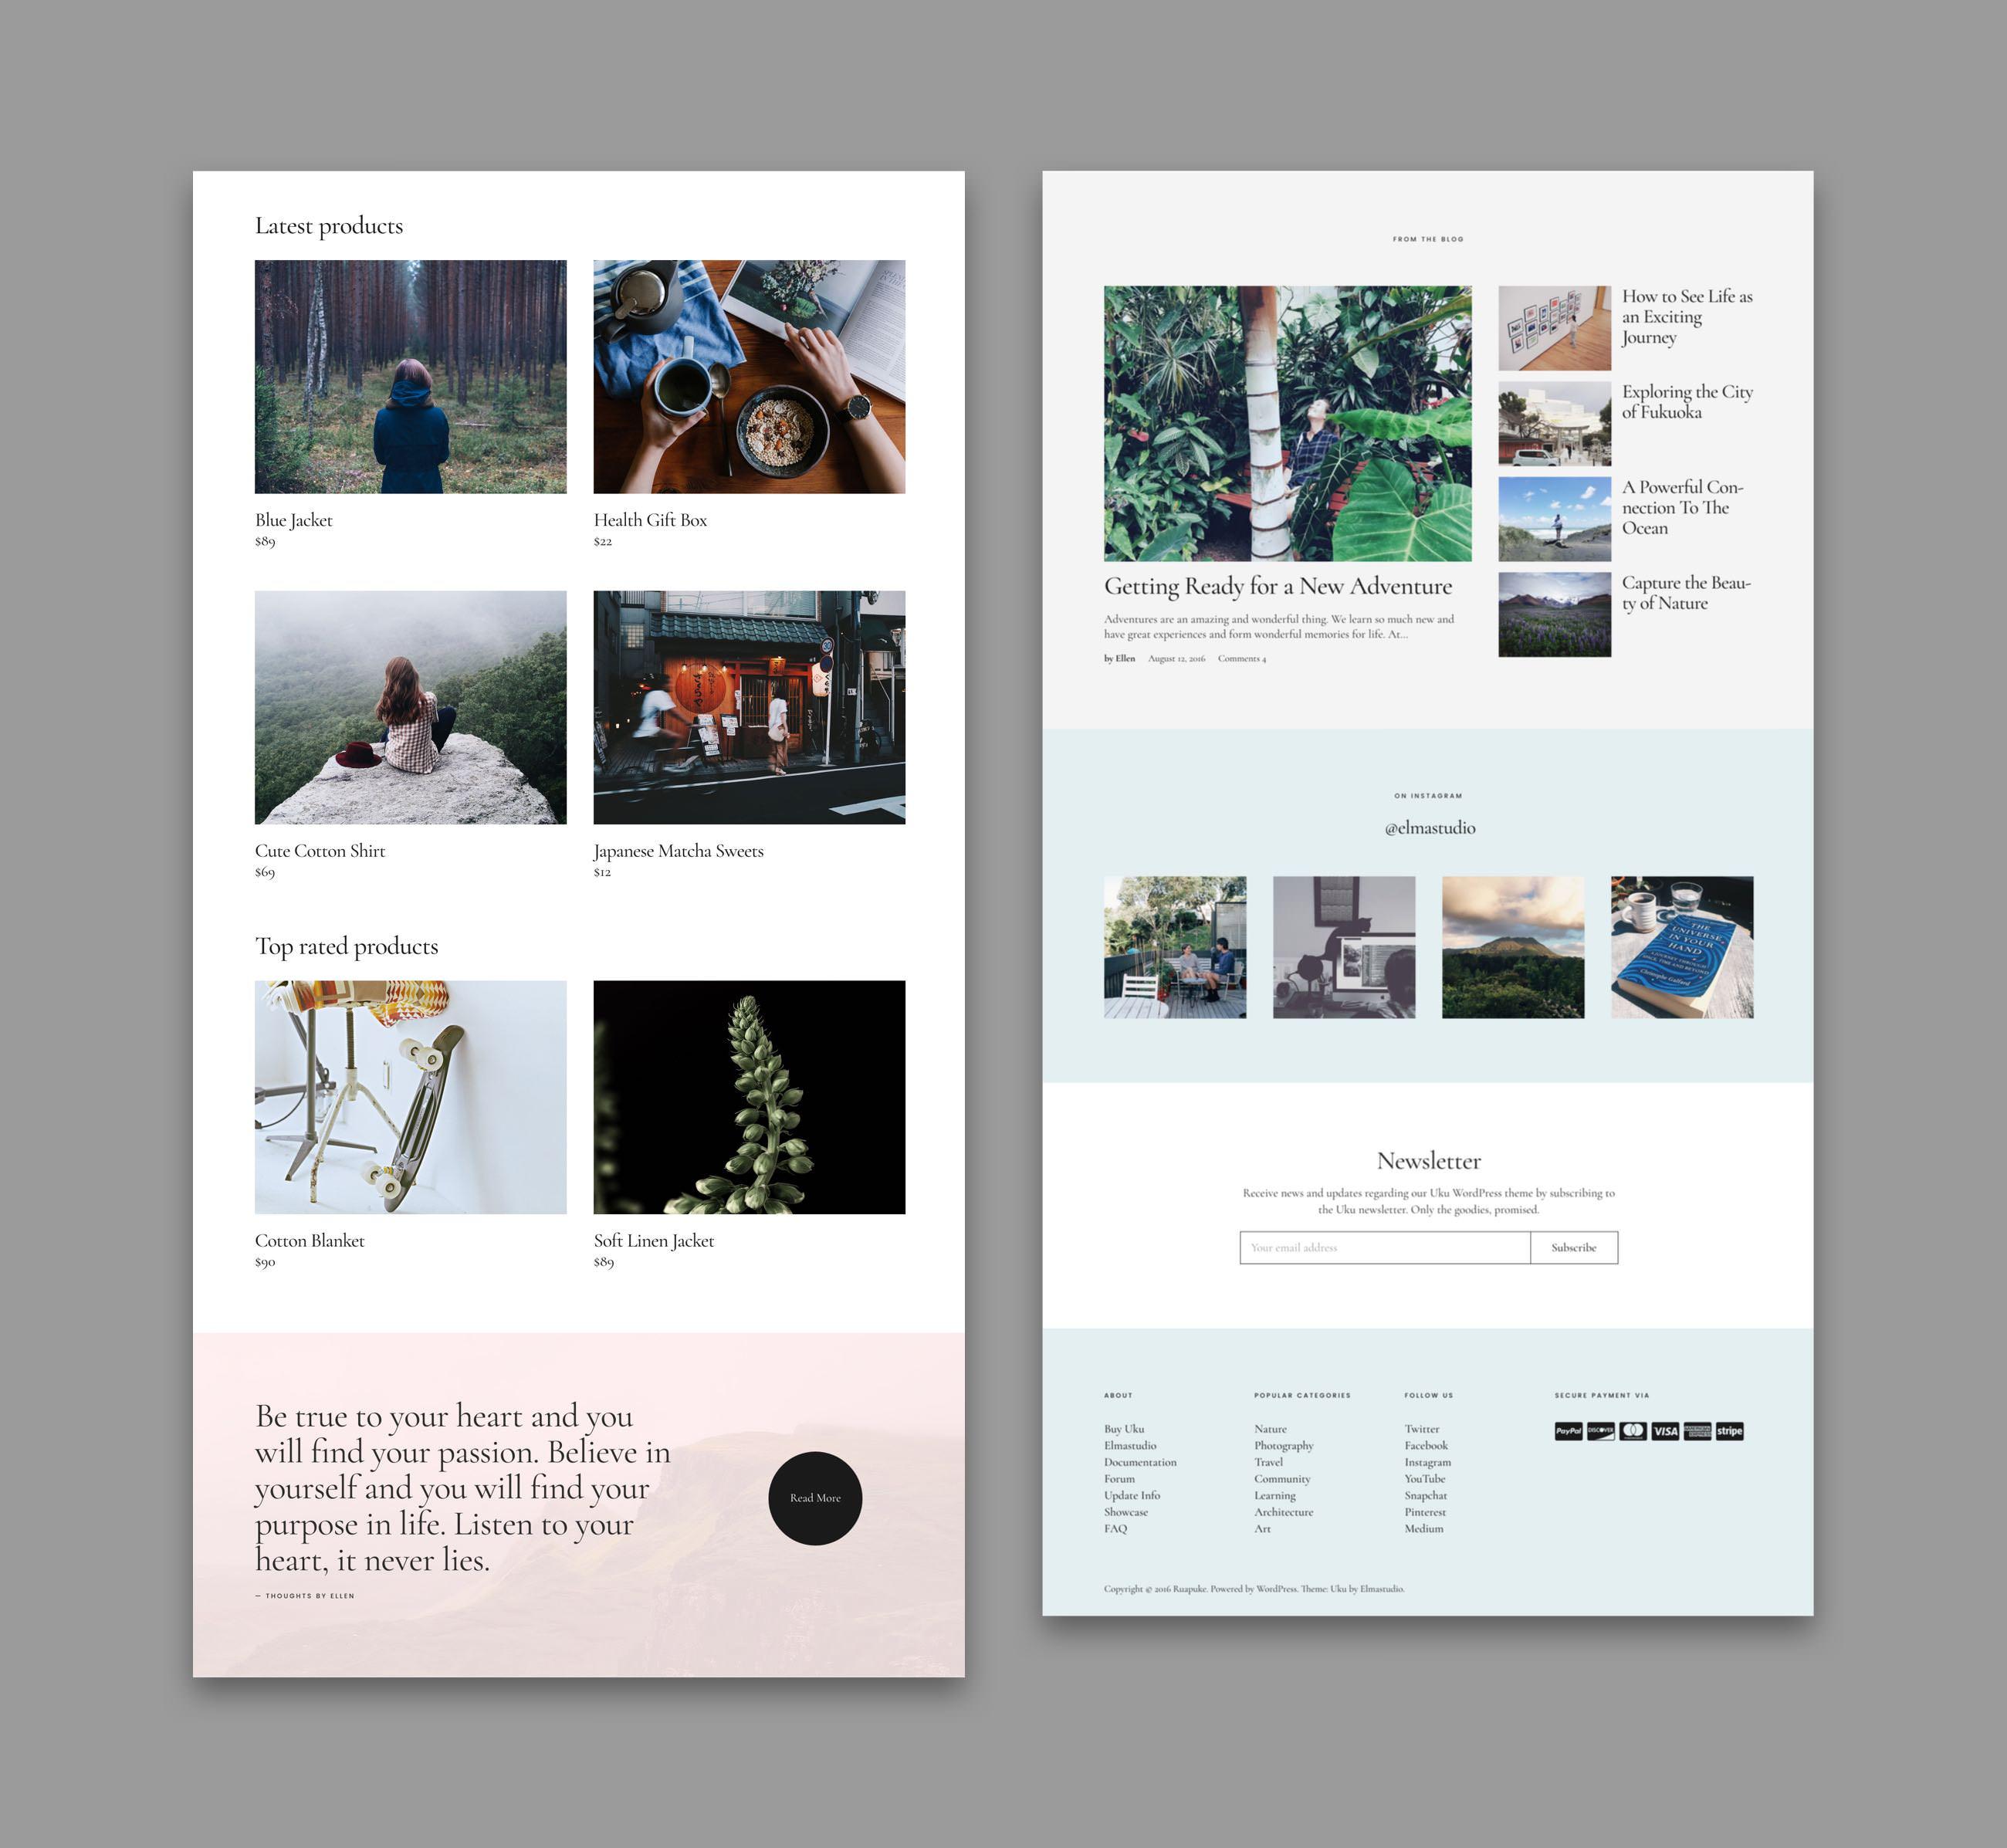 uku-wordpress-theme-woocommerce-update-shop-front